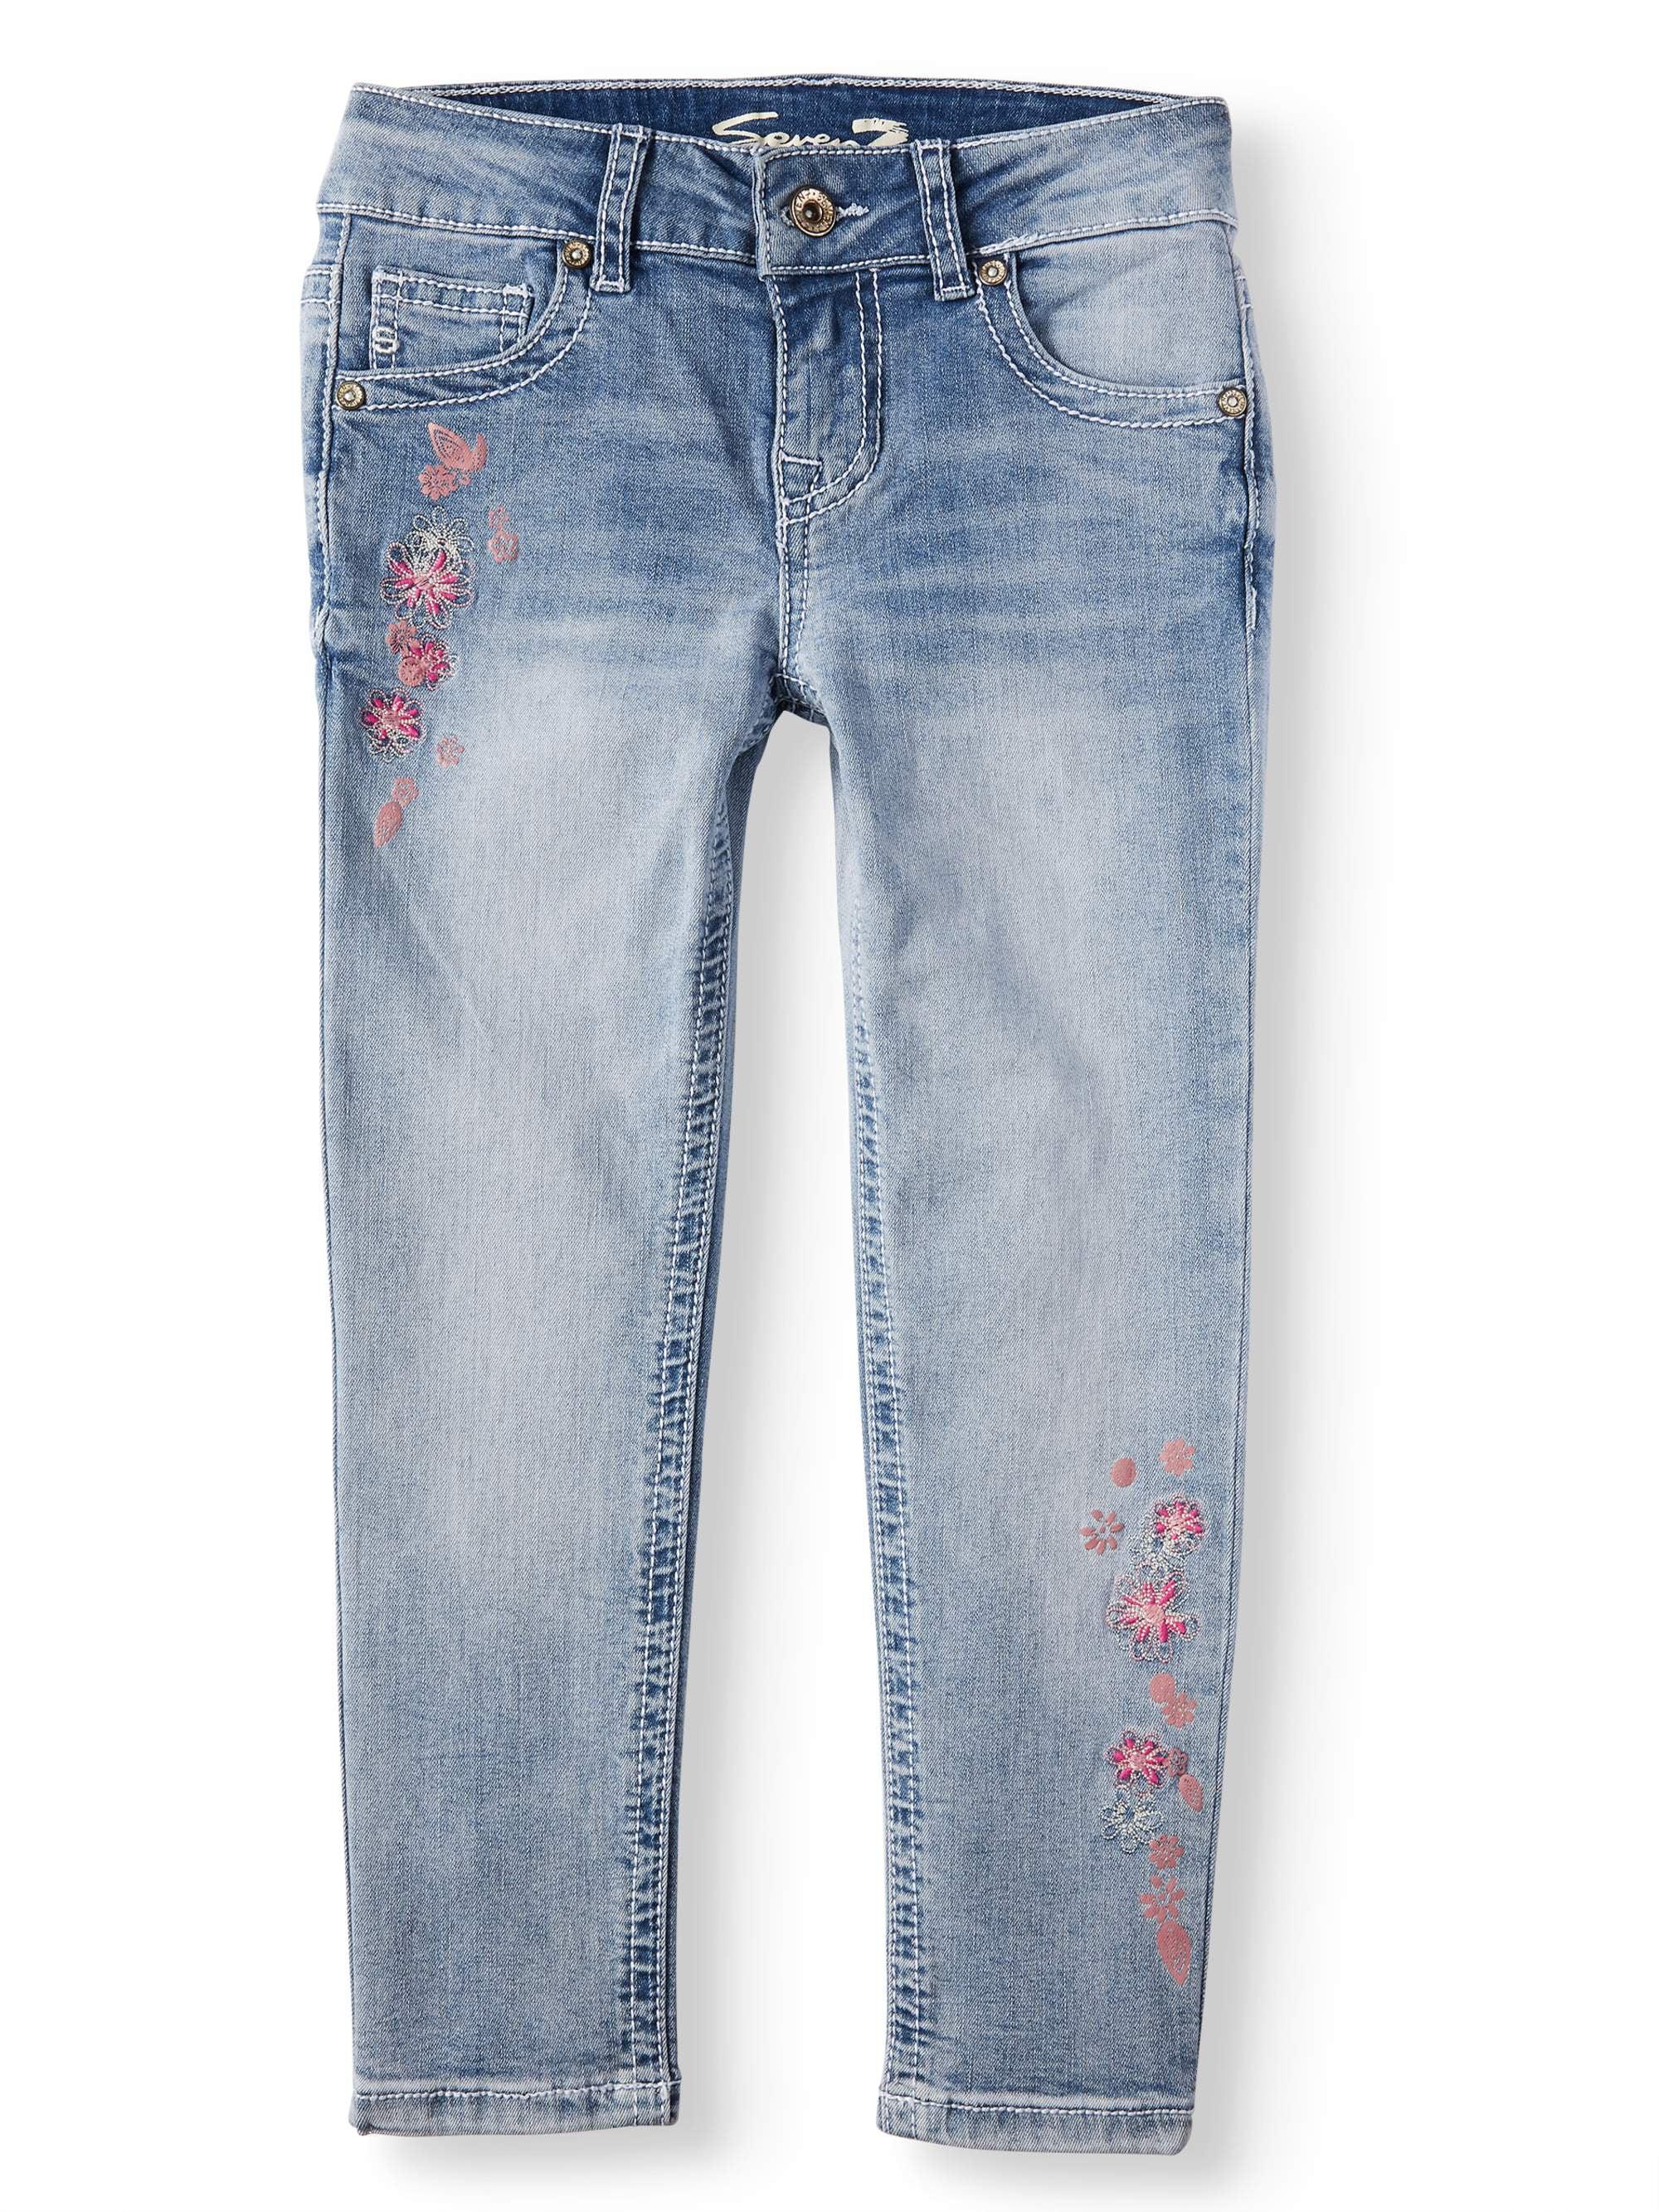 Embroidered Floral Ankle Skinny Jean (Big Girls)